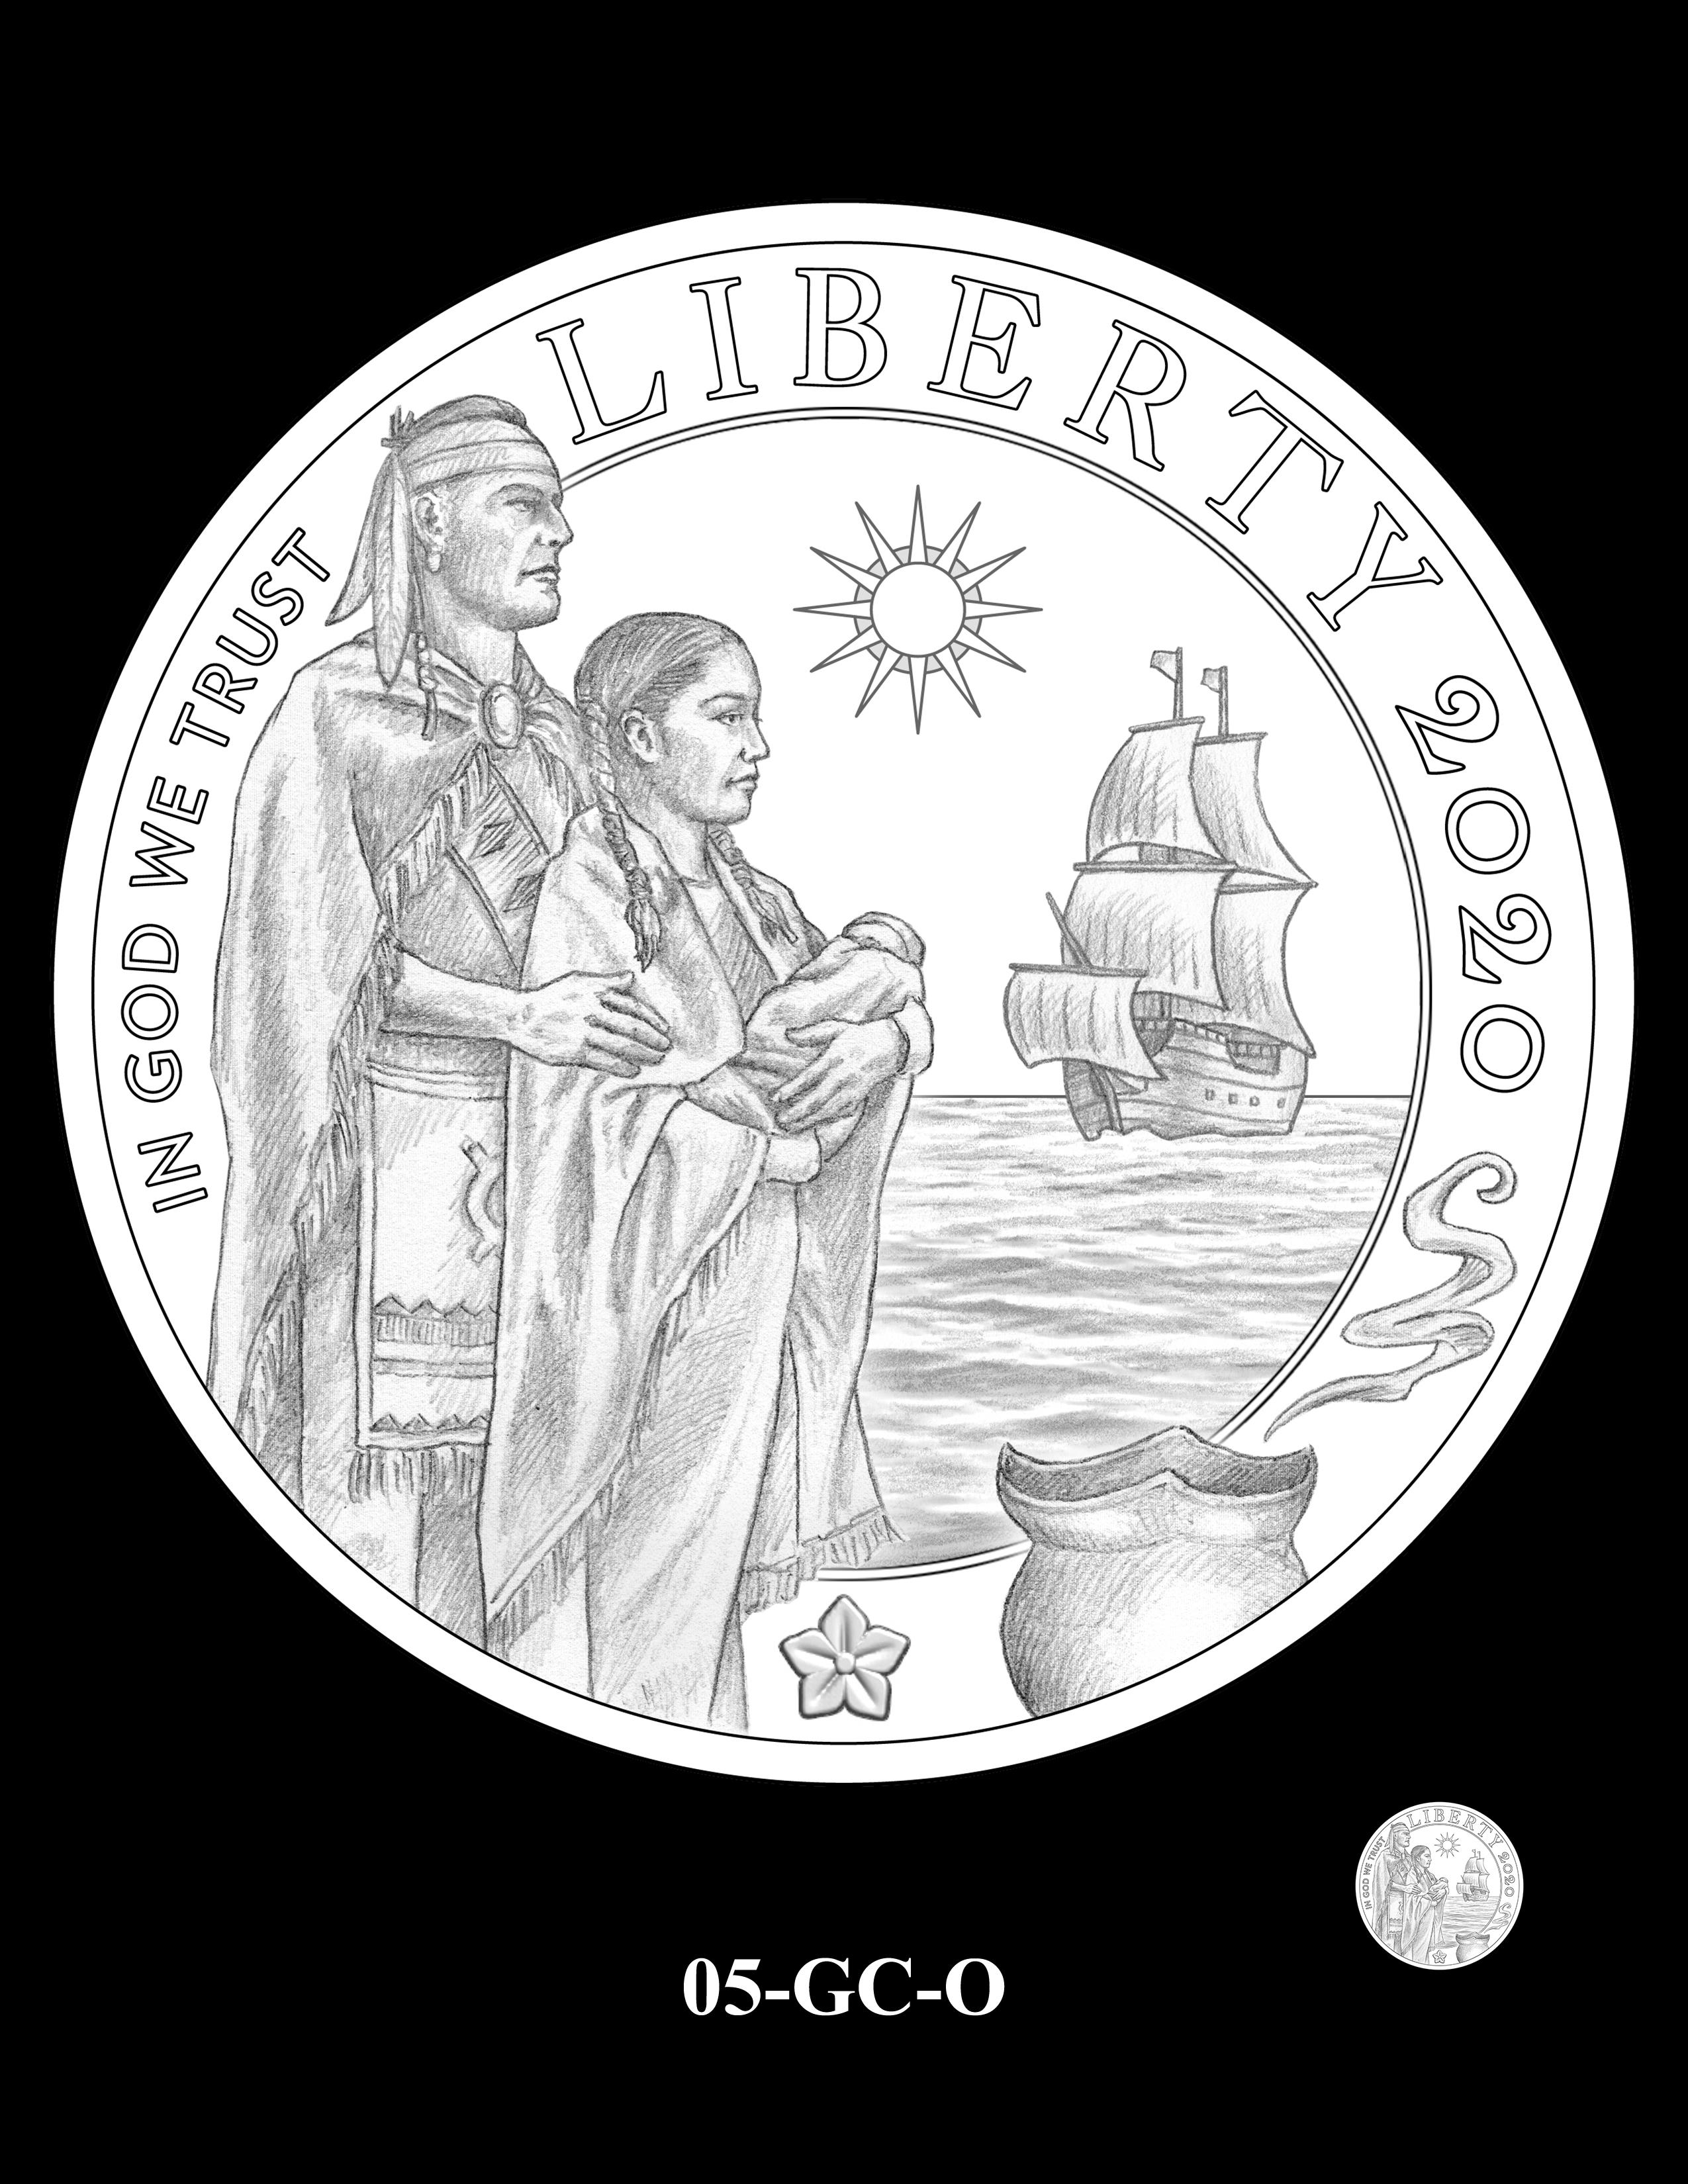 05-GC-O - 2020 Mayflower 400th Anniversary 24K Gold Coin & Silver Medal Program